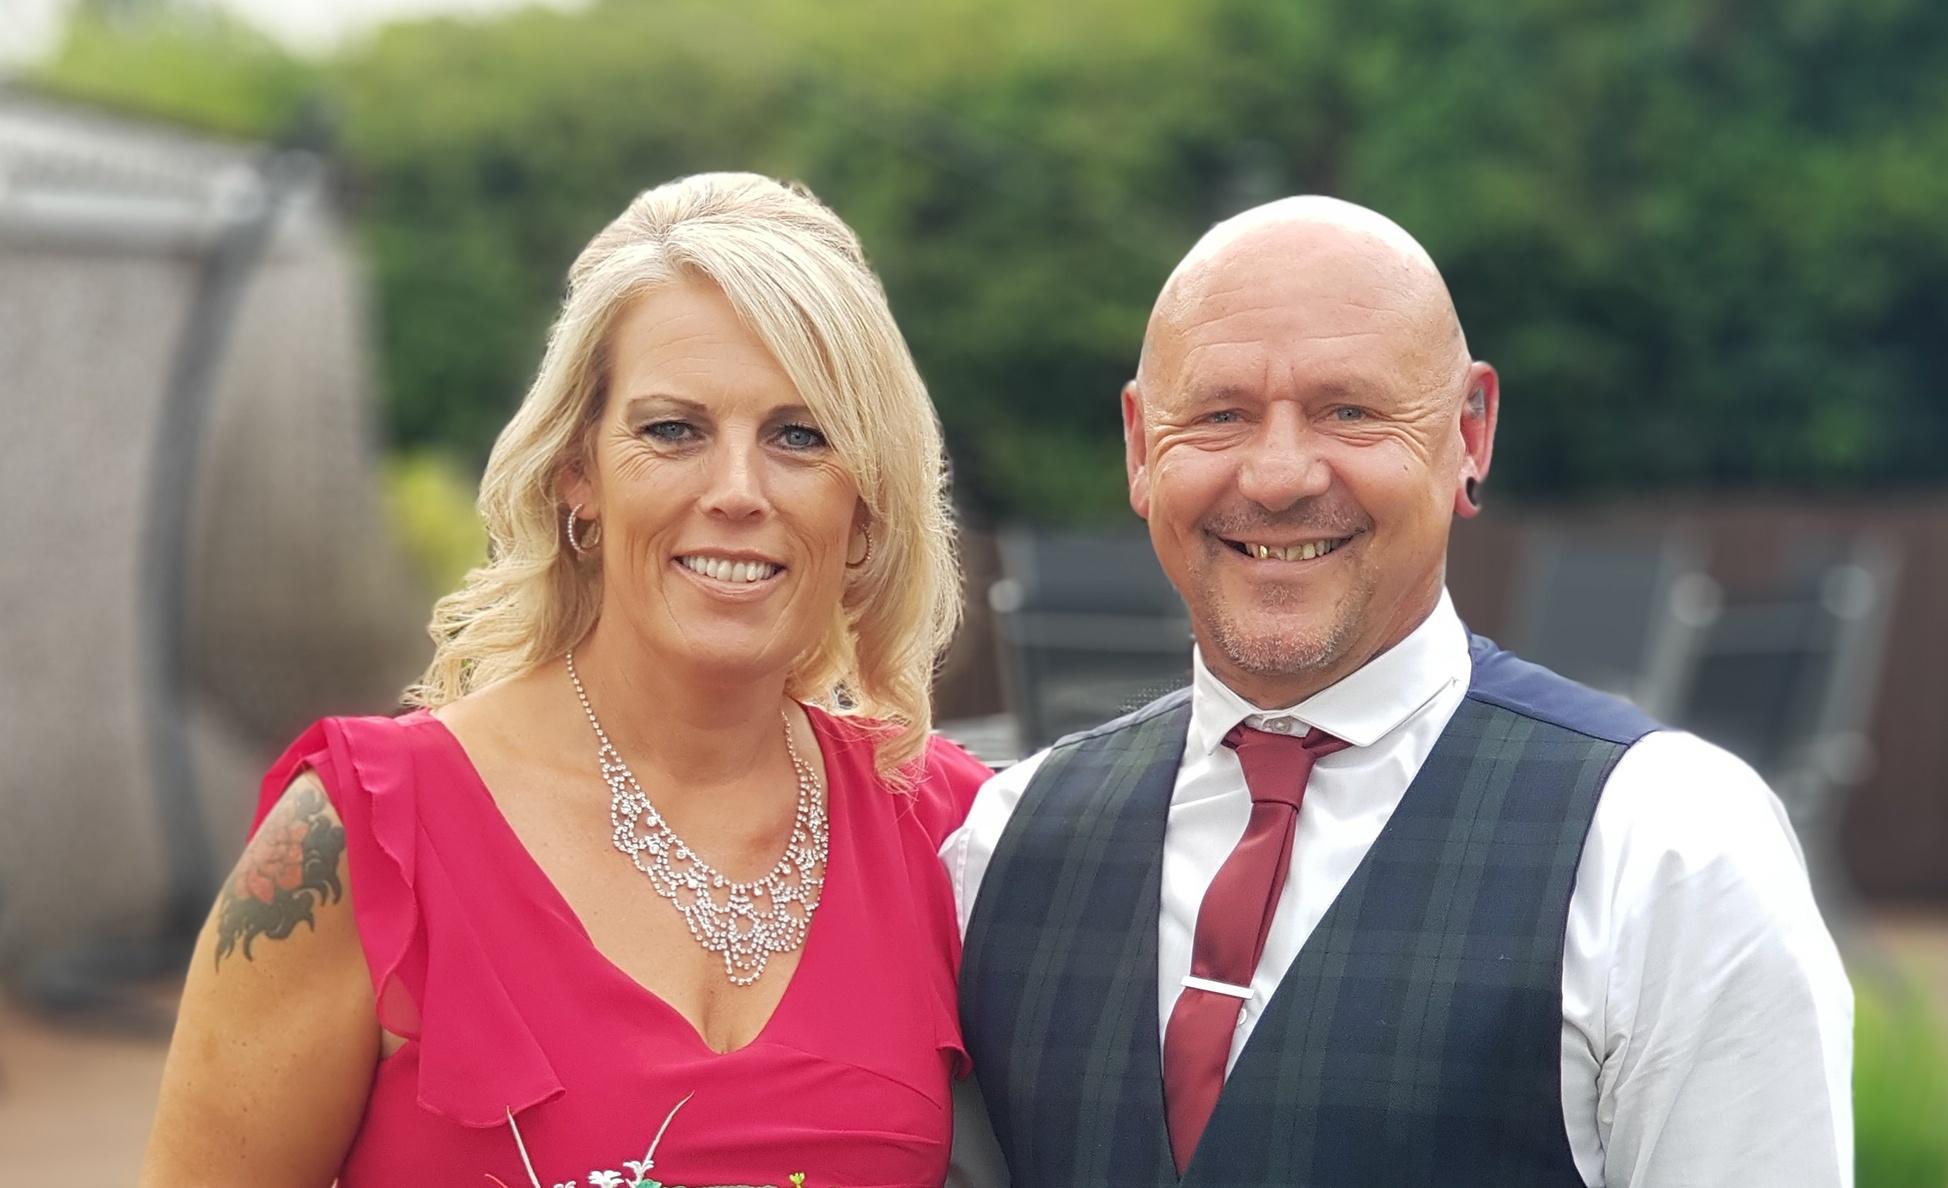 Graham as best man with wife Rachel